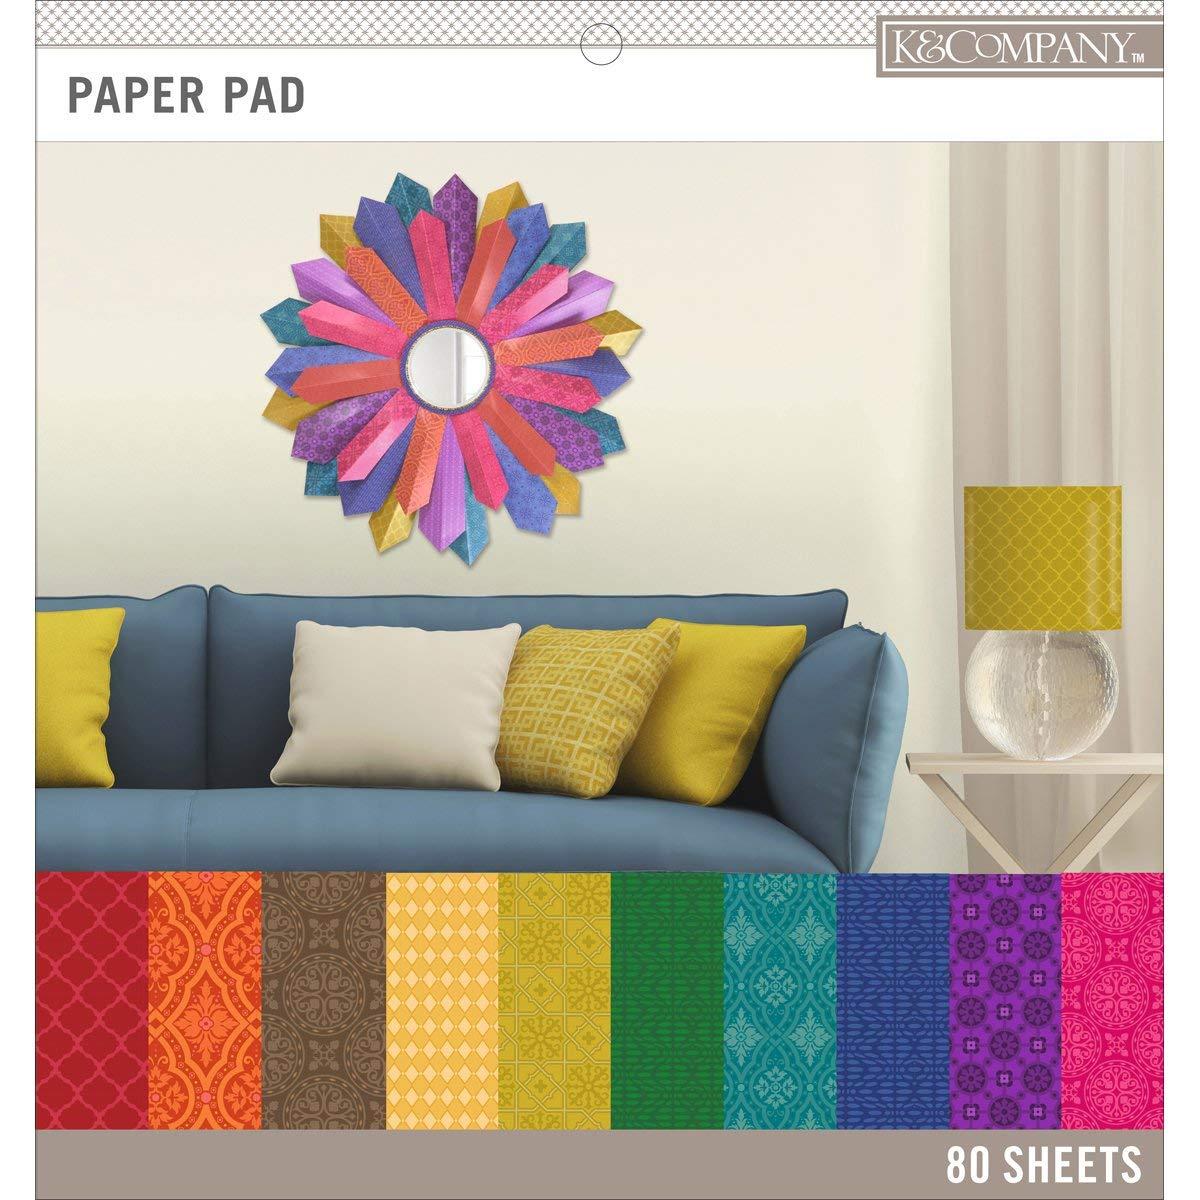 "K&Company Basics 12""X12"" Paper Pad 80/Pkg-Darks, 20 Designs/4 Each"